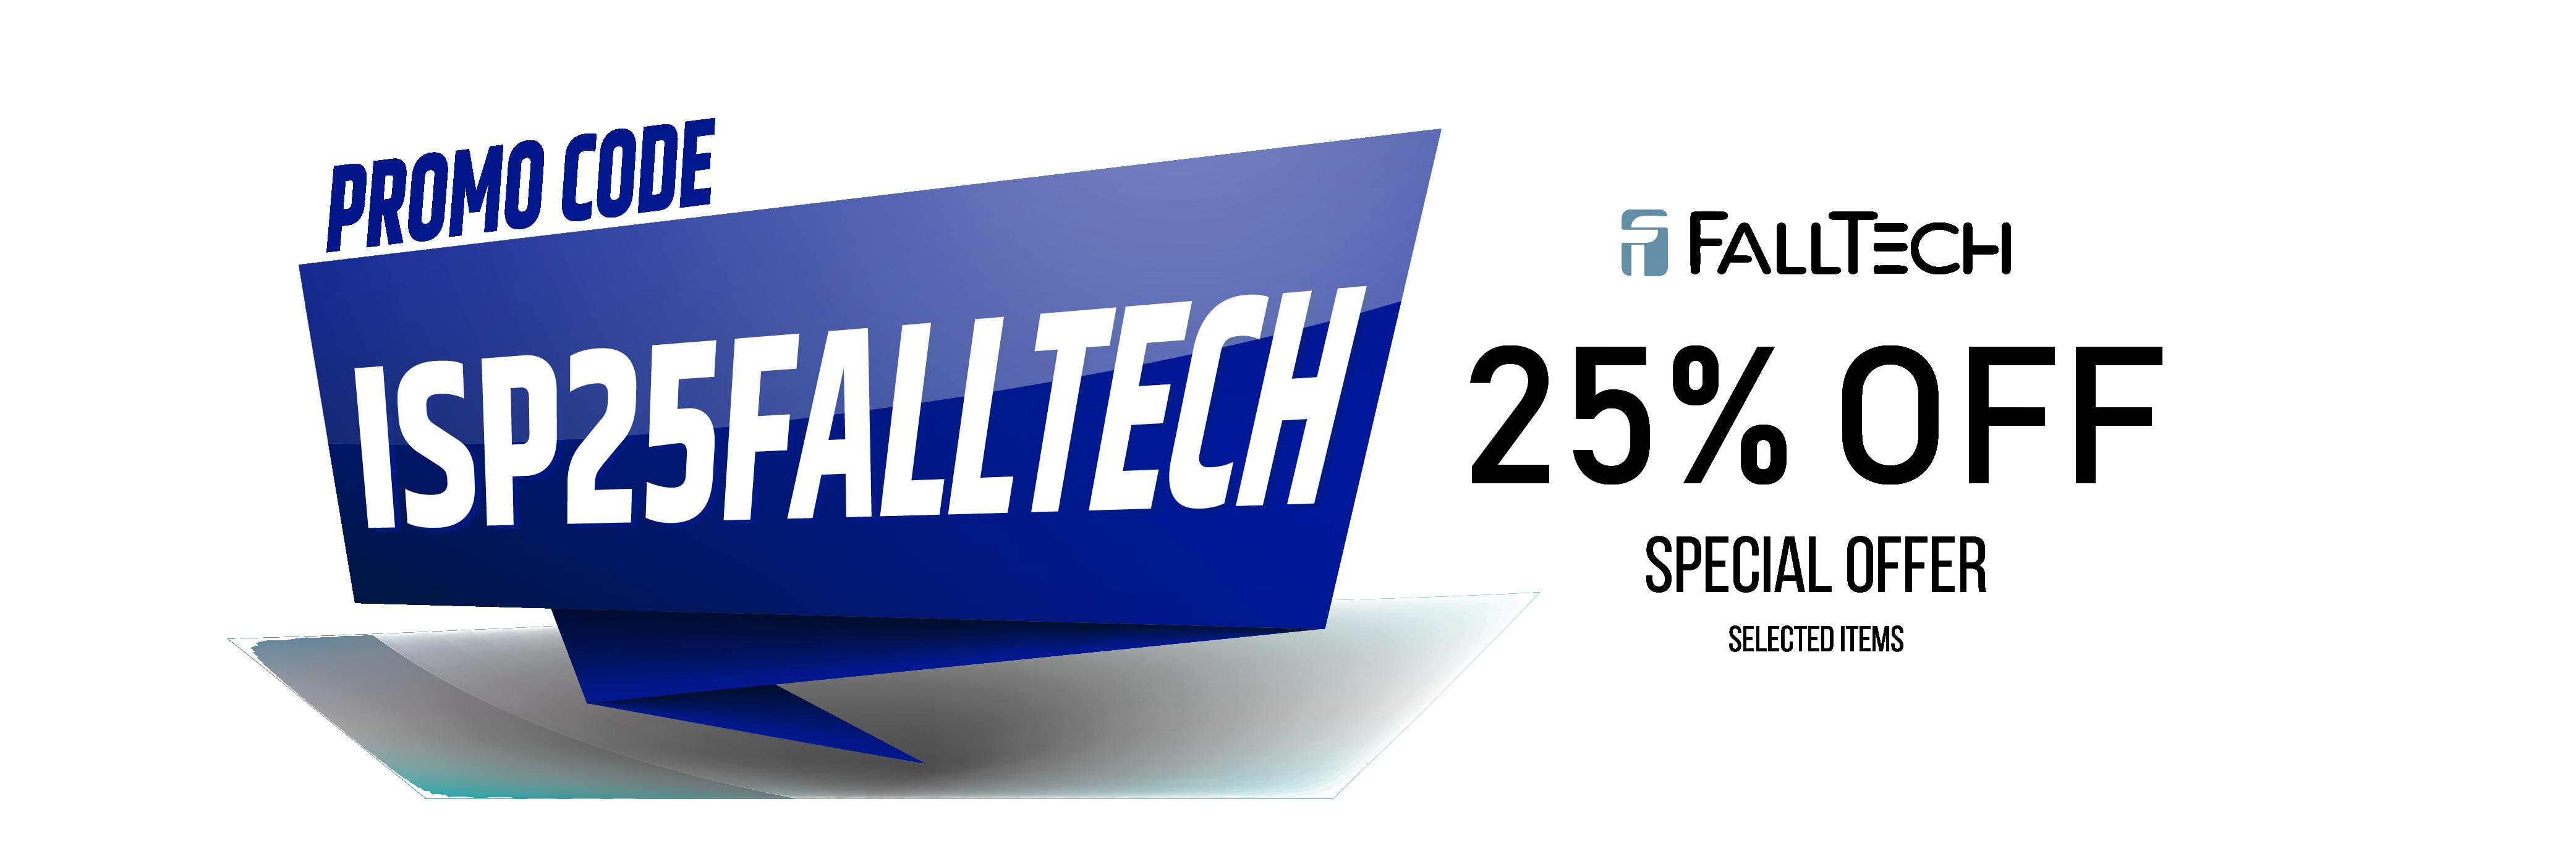 falltech-promo-01.png